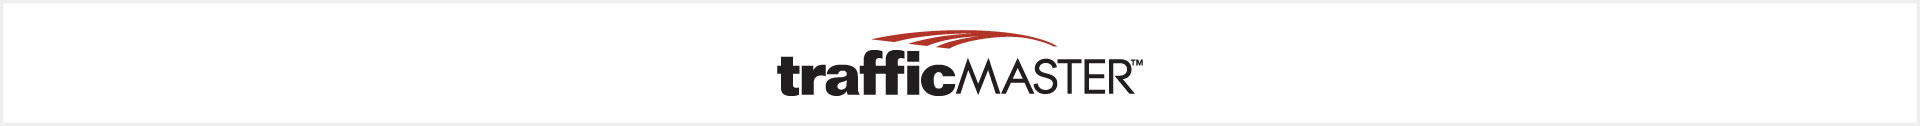 Trafficmaster brand banner